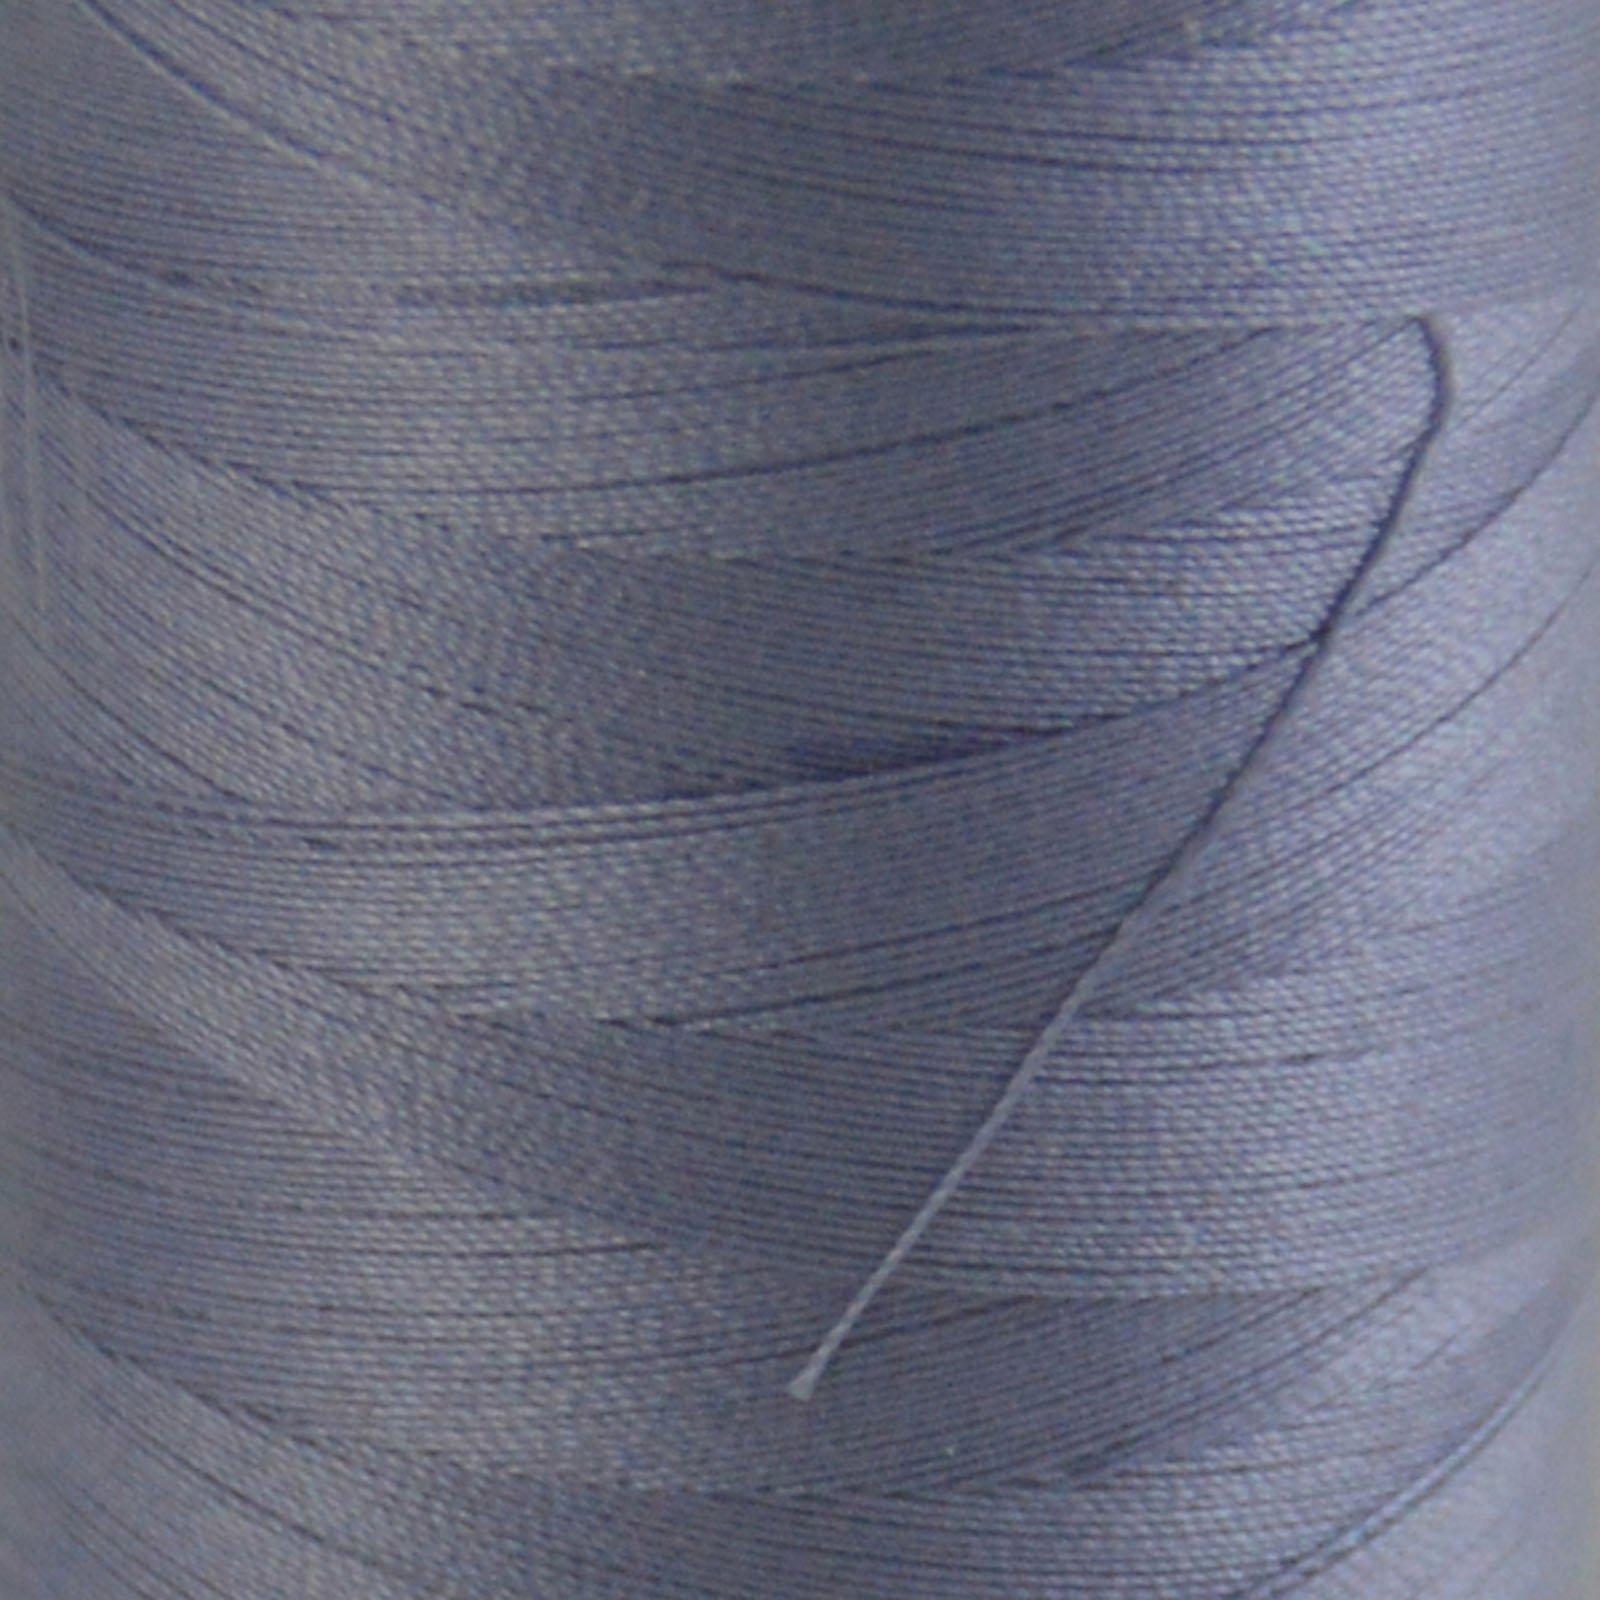 # 2524 Grey Violet